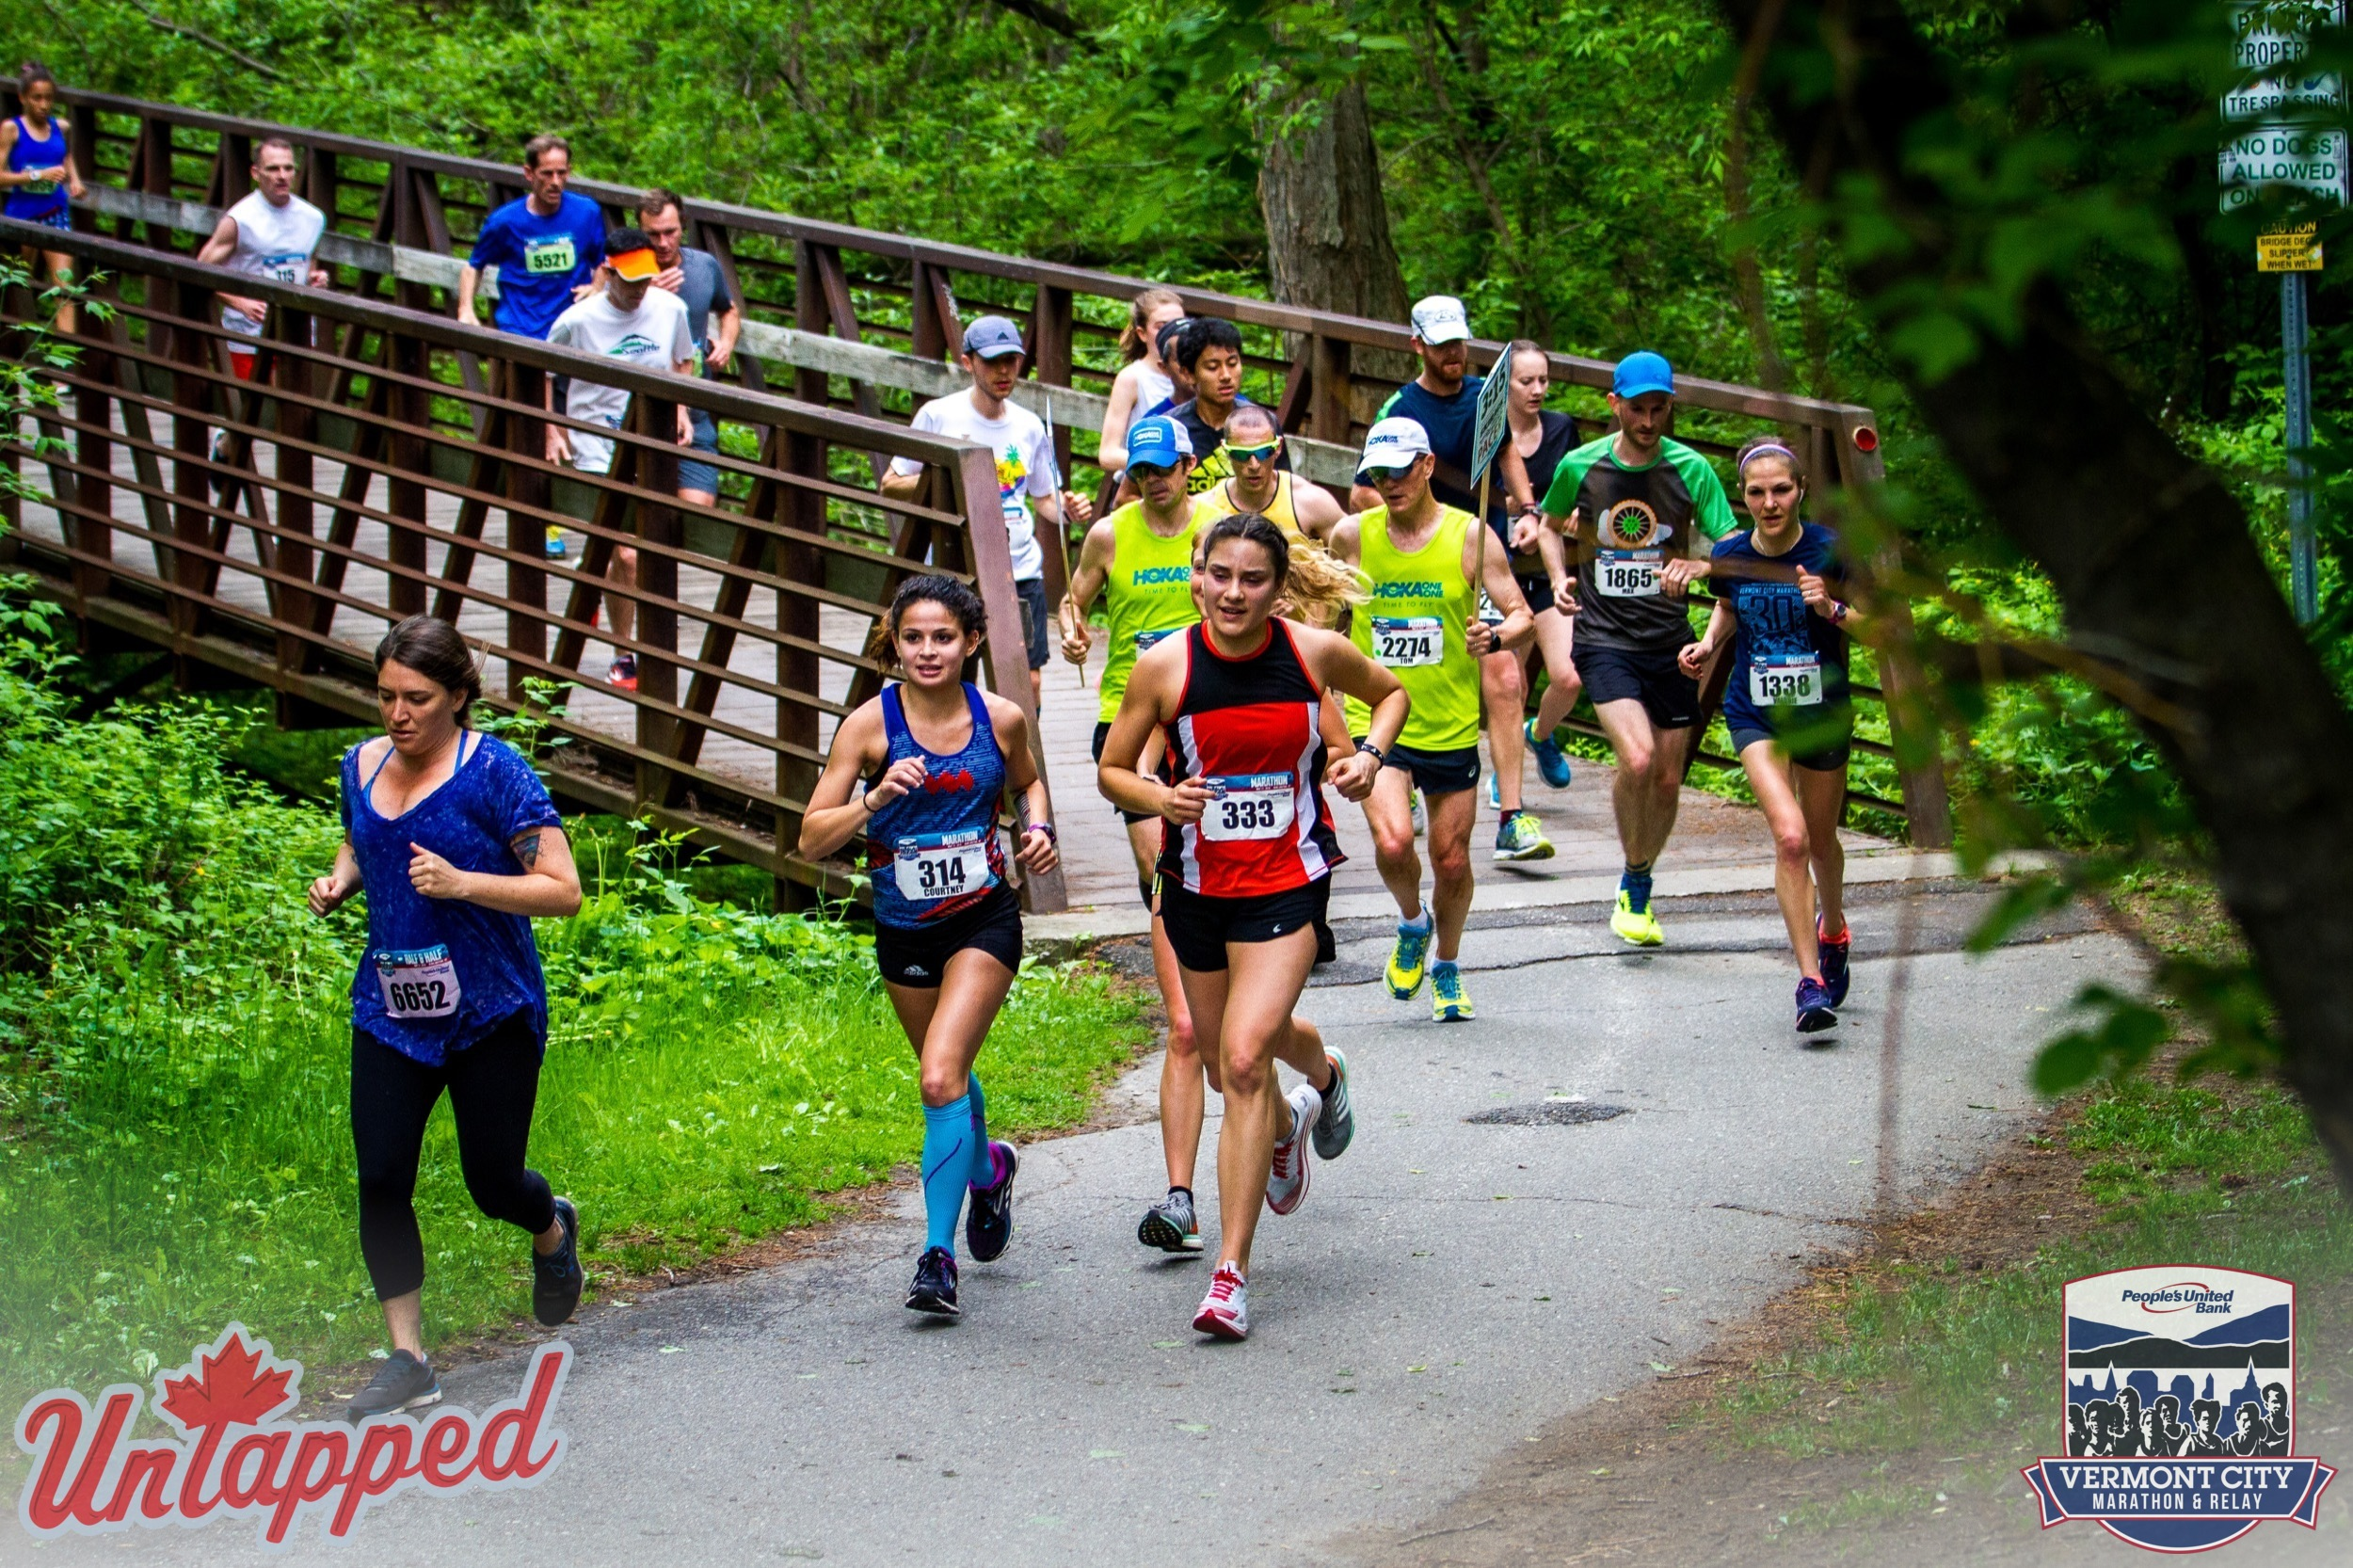 race_3931_photo_61426856